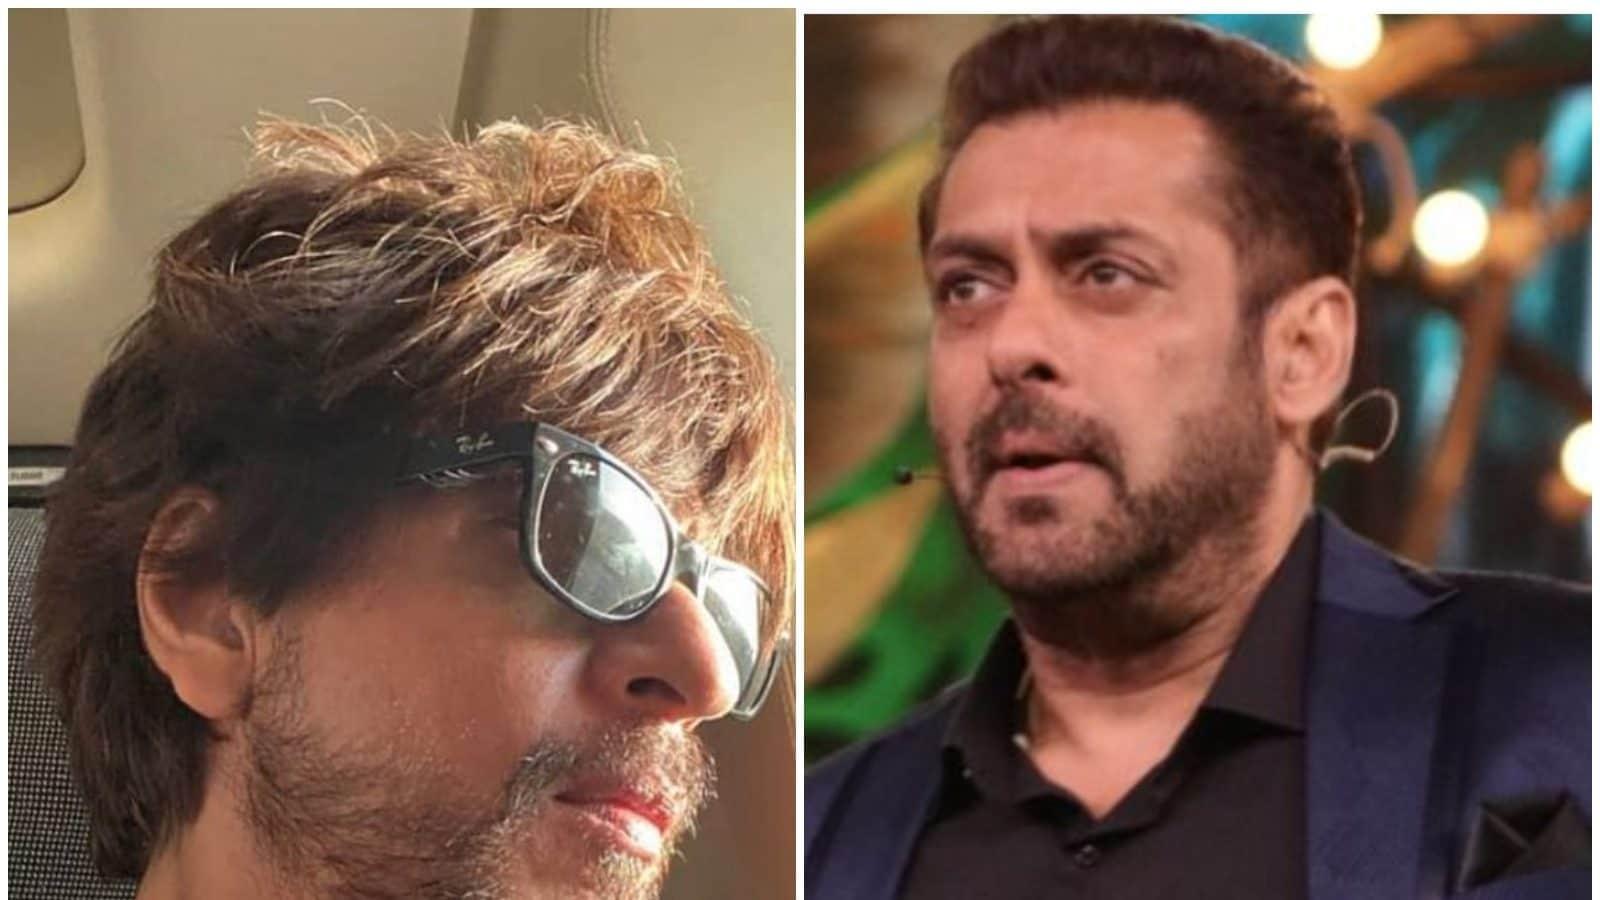 Shah Rukh Khan and Salman Khan Call Off Pathan, Tiger 3 Shoots Amid Aryan Khan Case